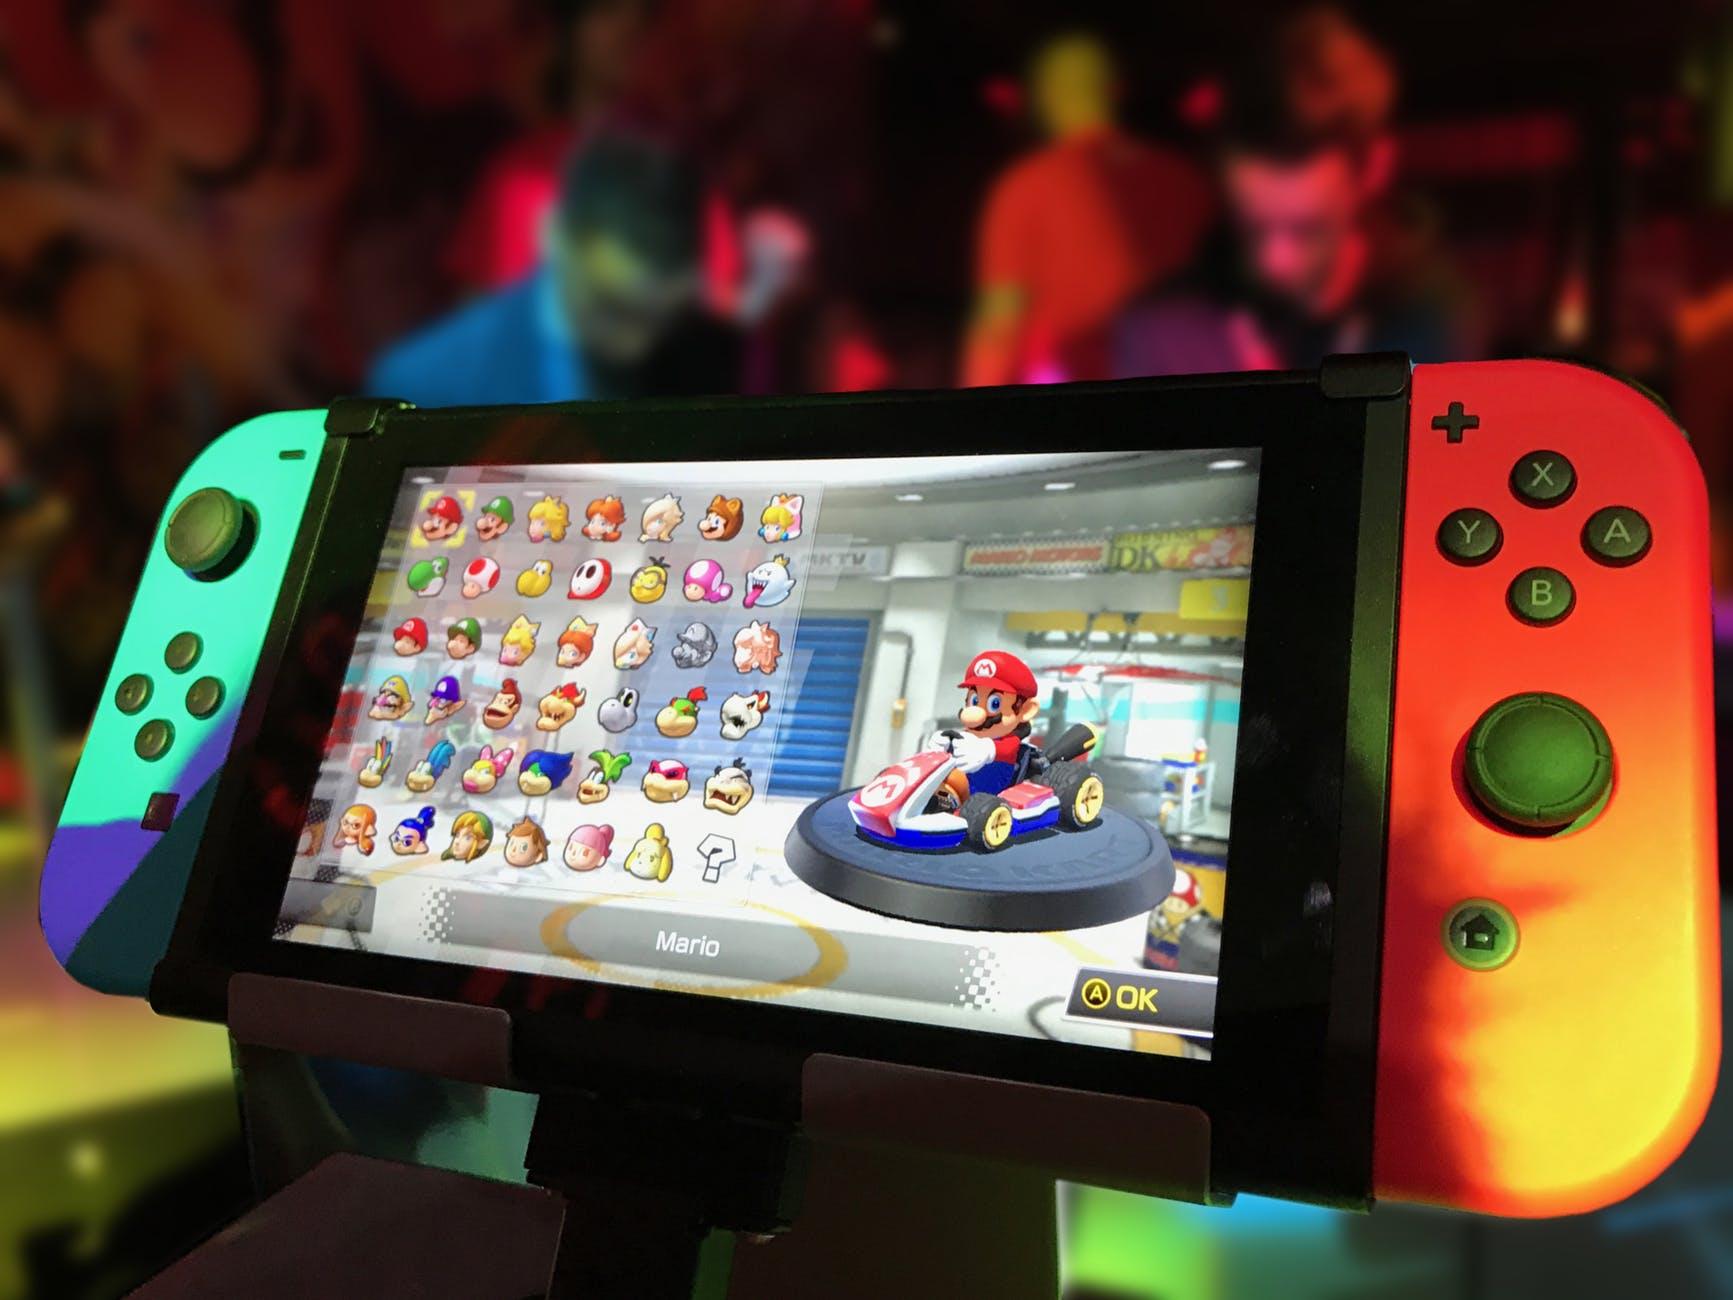 Game Android Offline Terbaik 2019, Teman Senggang Hemat Kuota